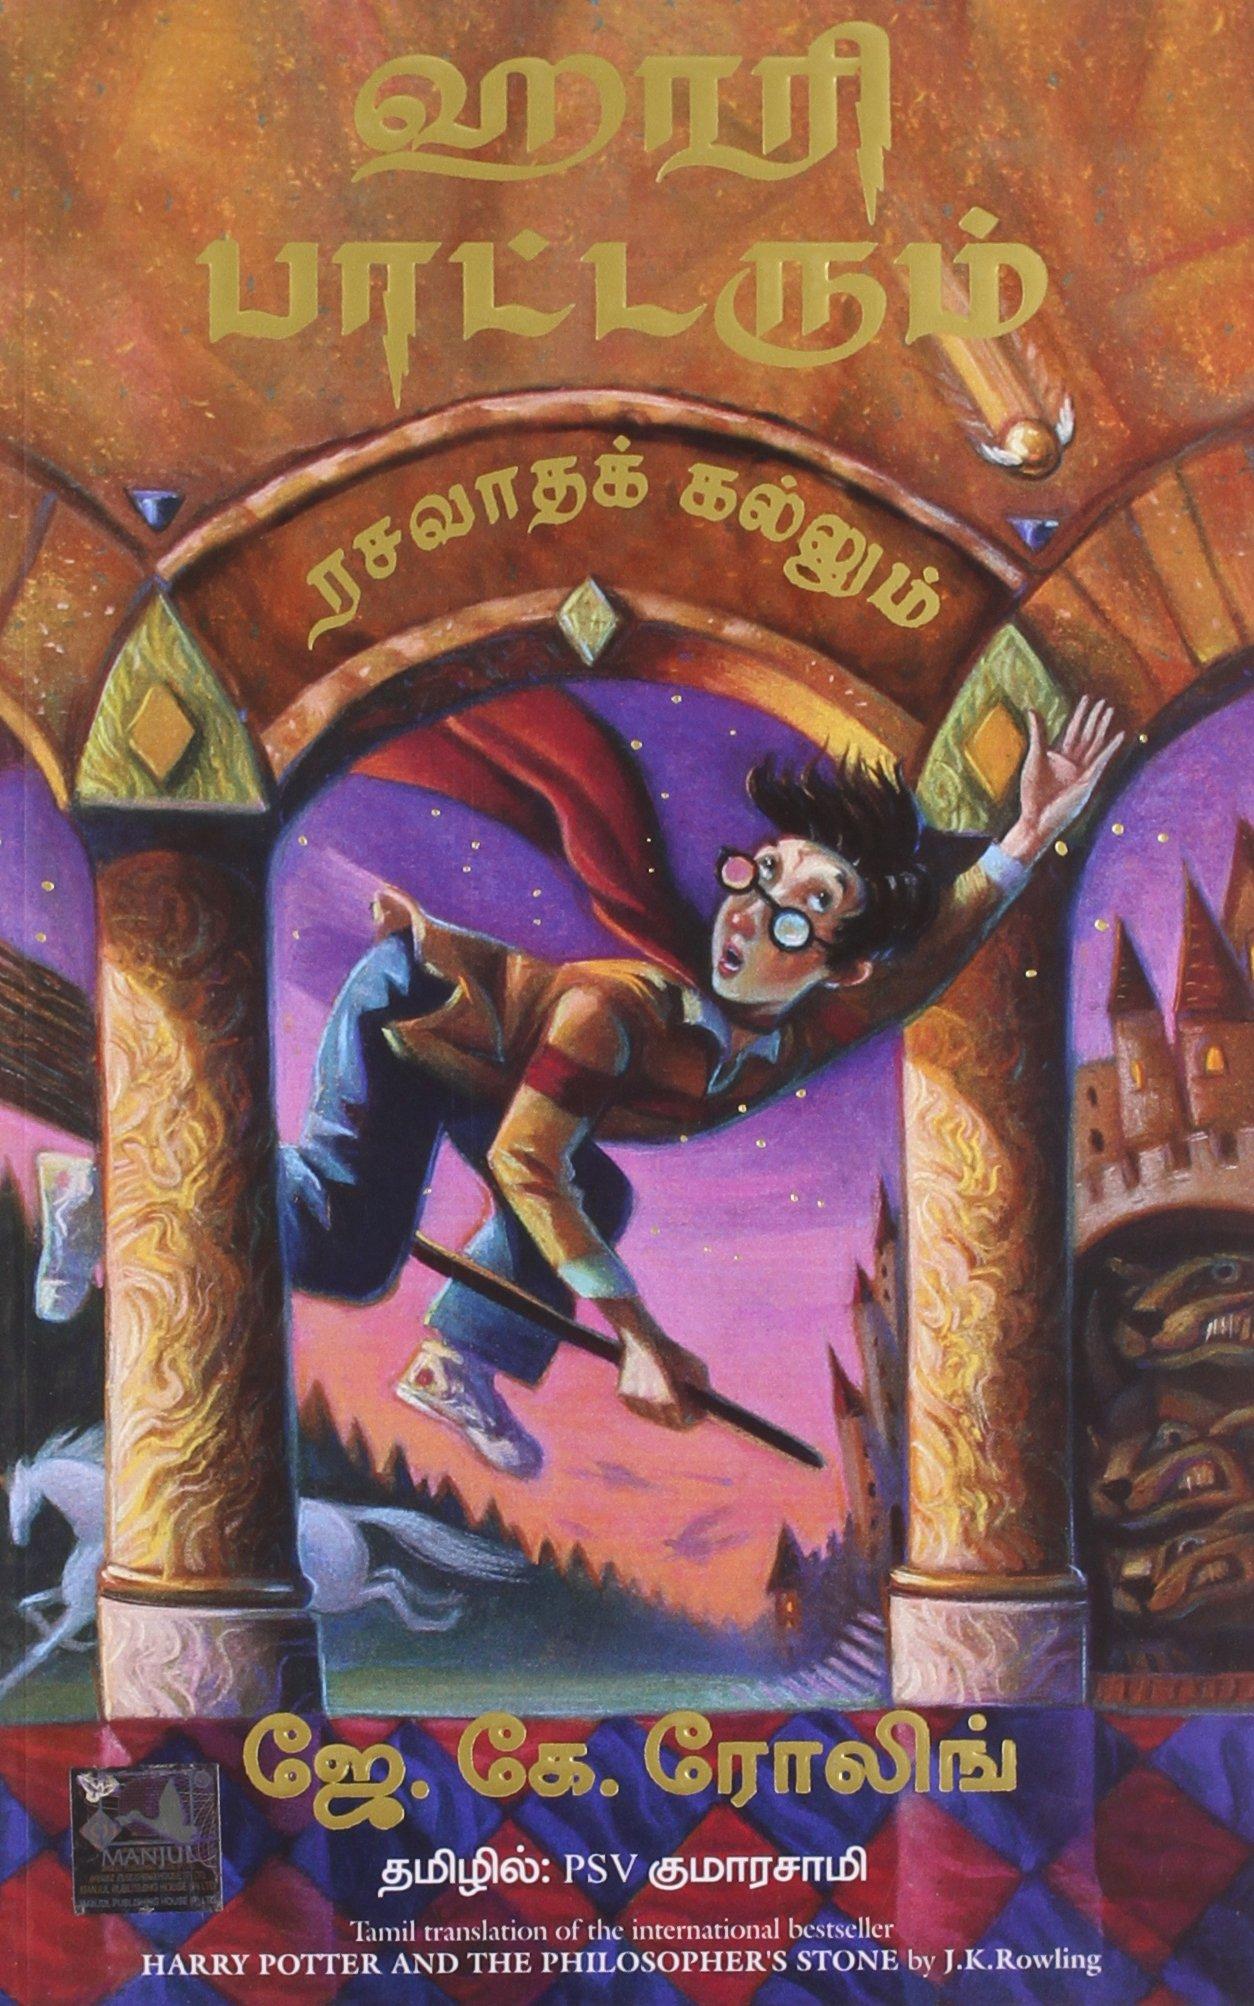 HARRY POTTER AND THE PHILOSOPHERS STONE - Tamil - ஹாரி பாட்டரும் ரசவாதக்  கல்லும்